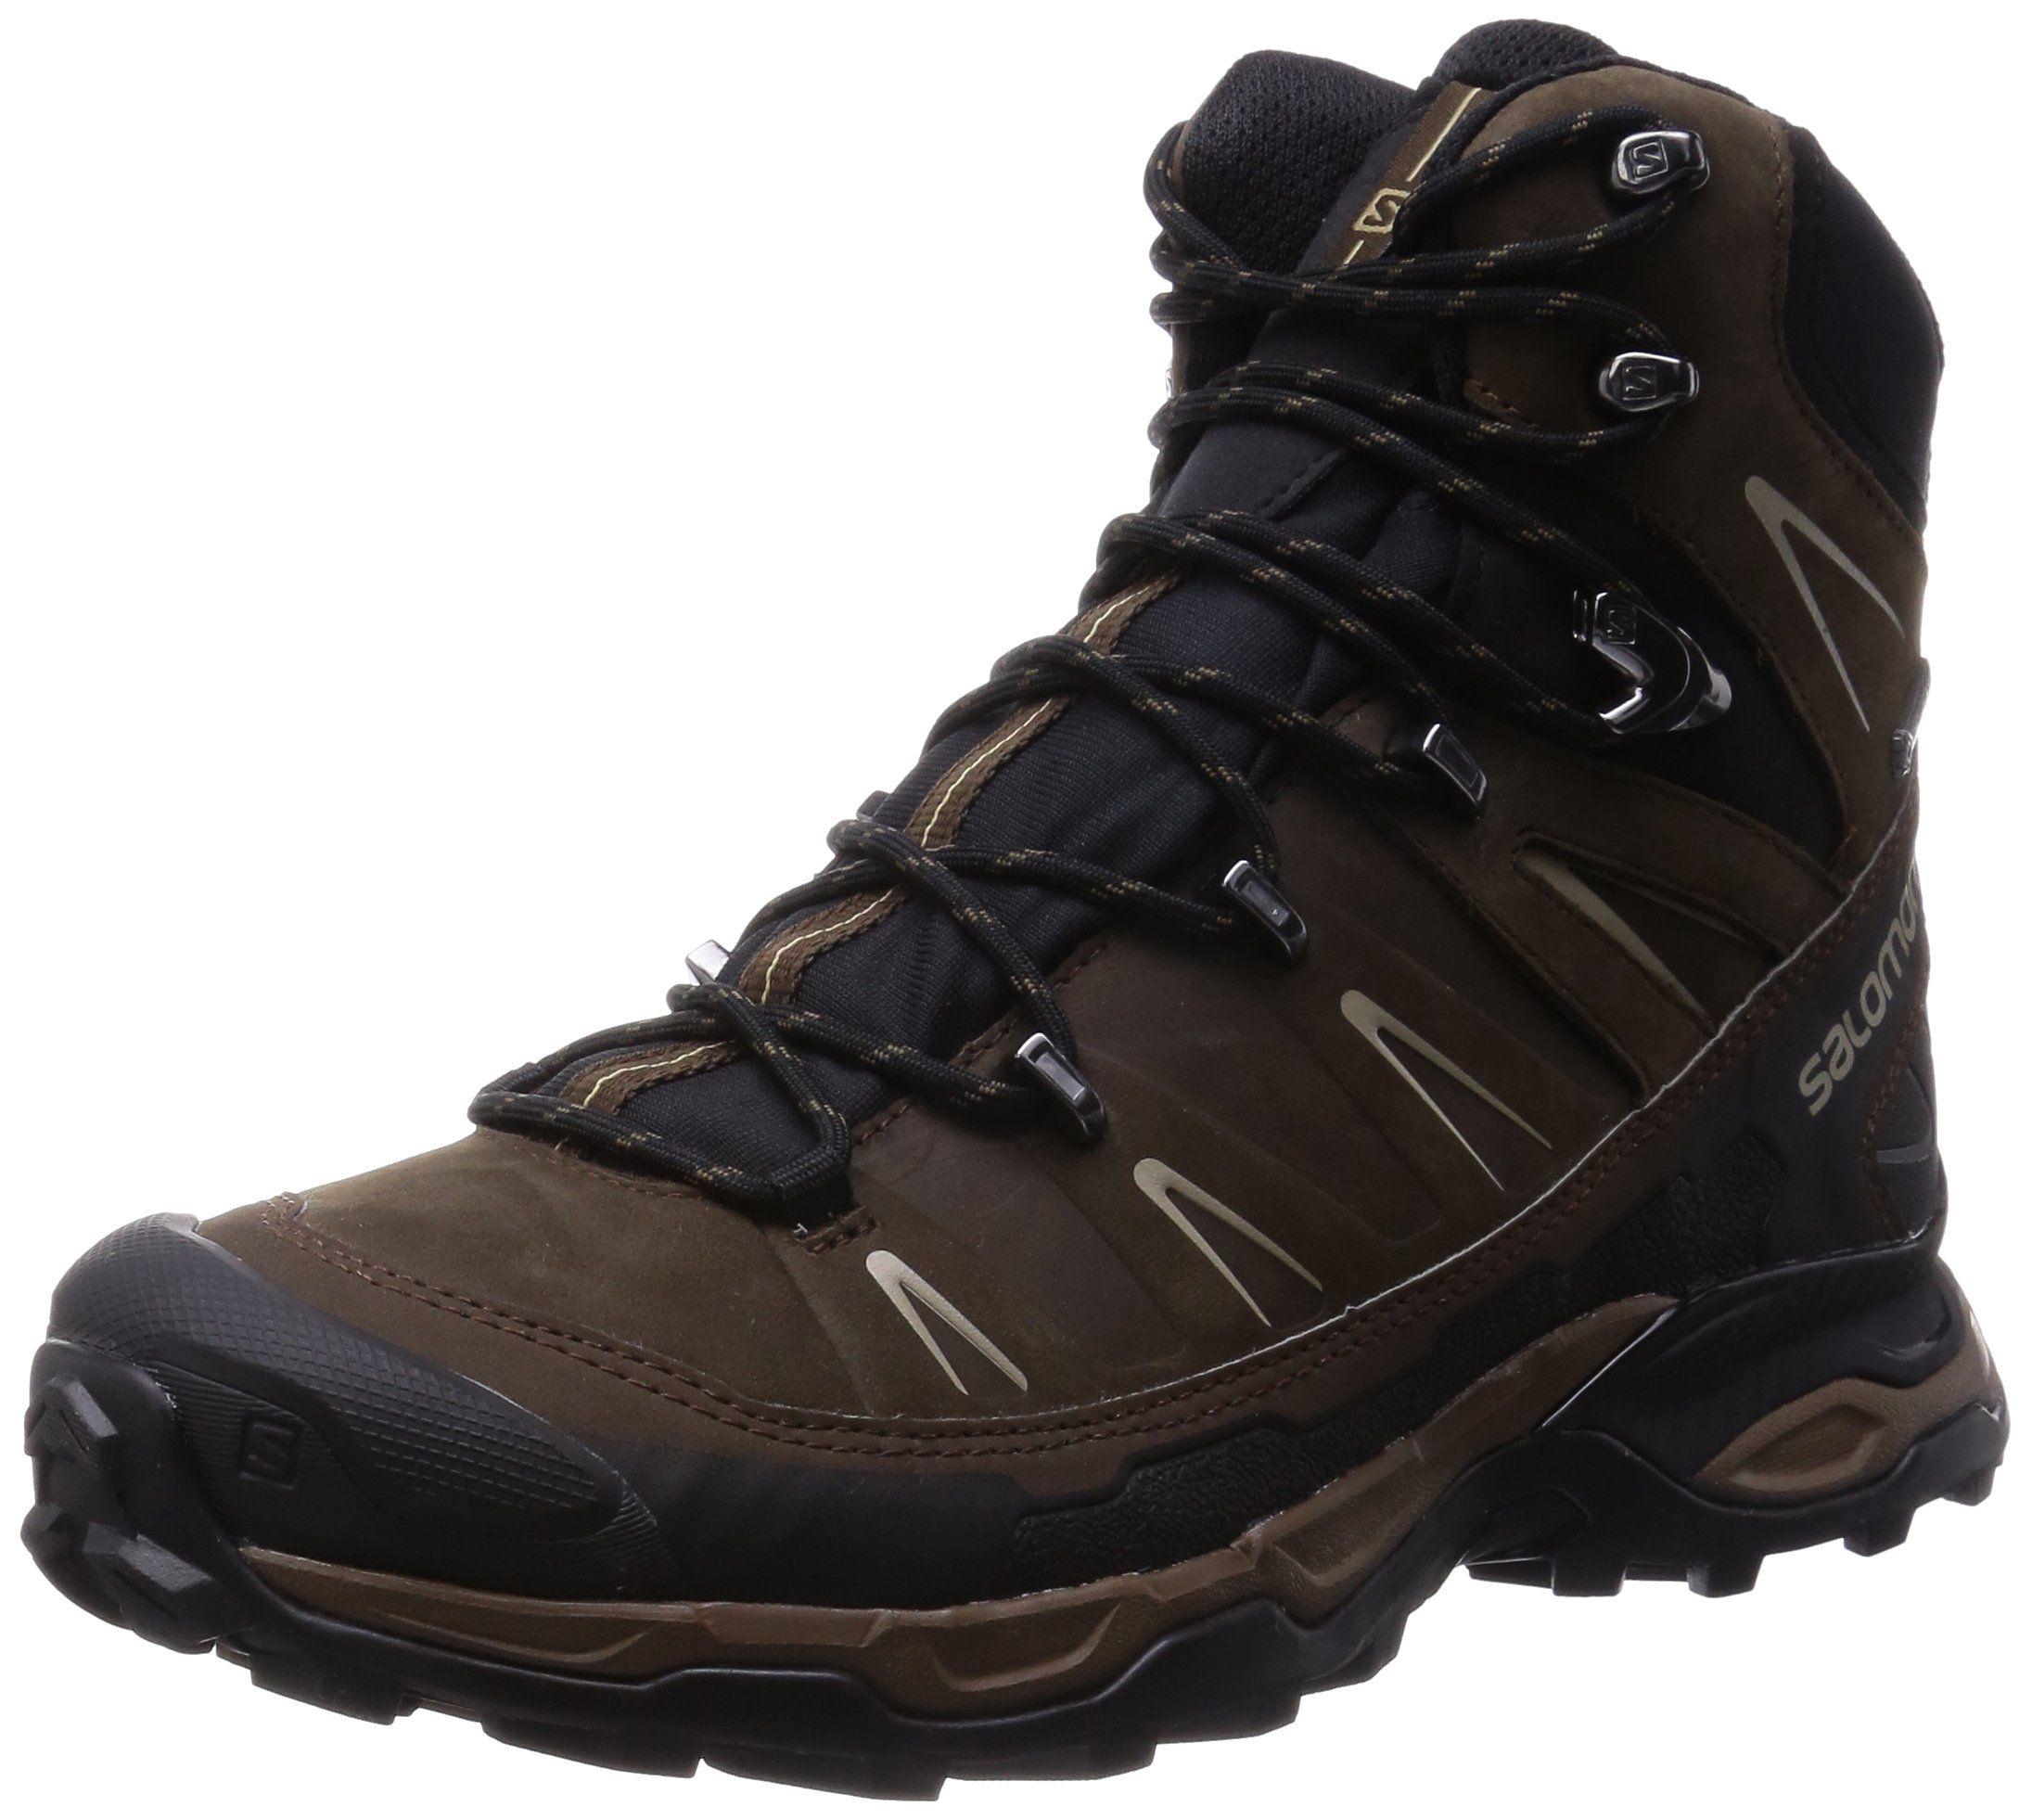 Salomon Men's X Ultra Trek Gtx Backpacking Boot,Absolute Brown/Black/Navajo,